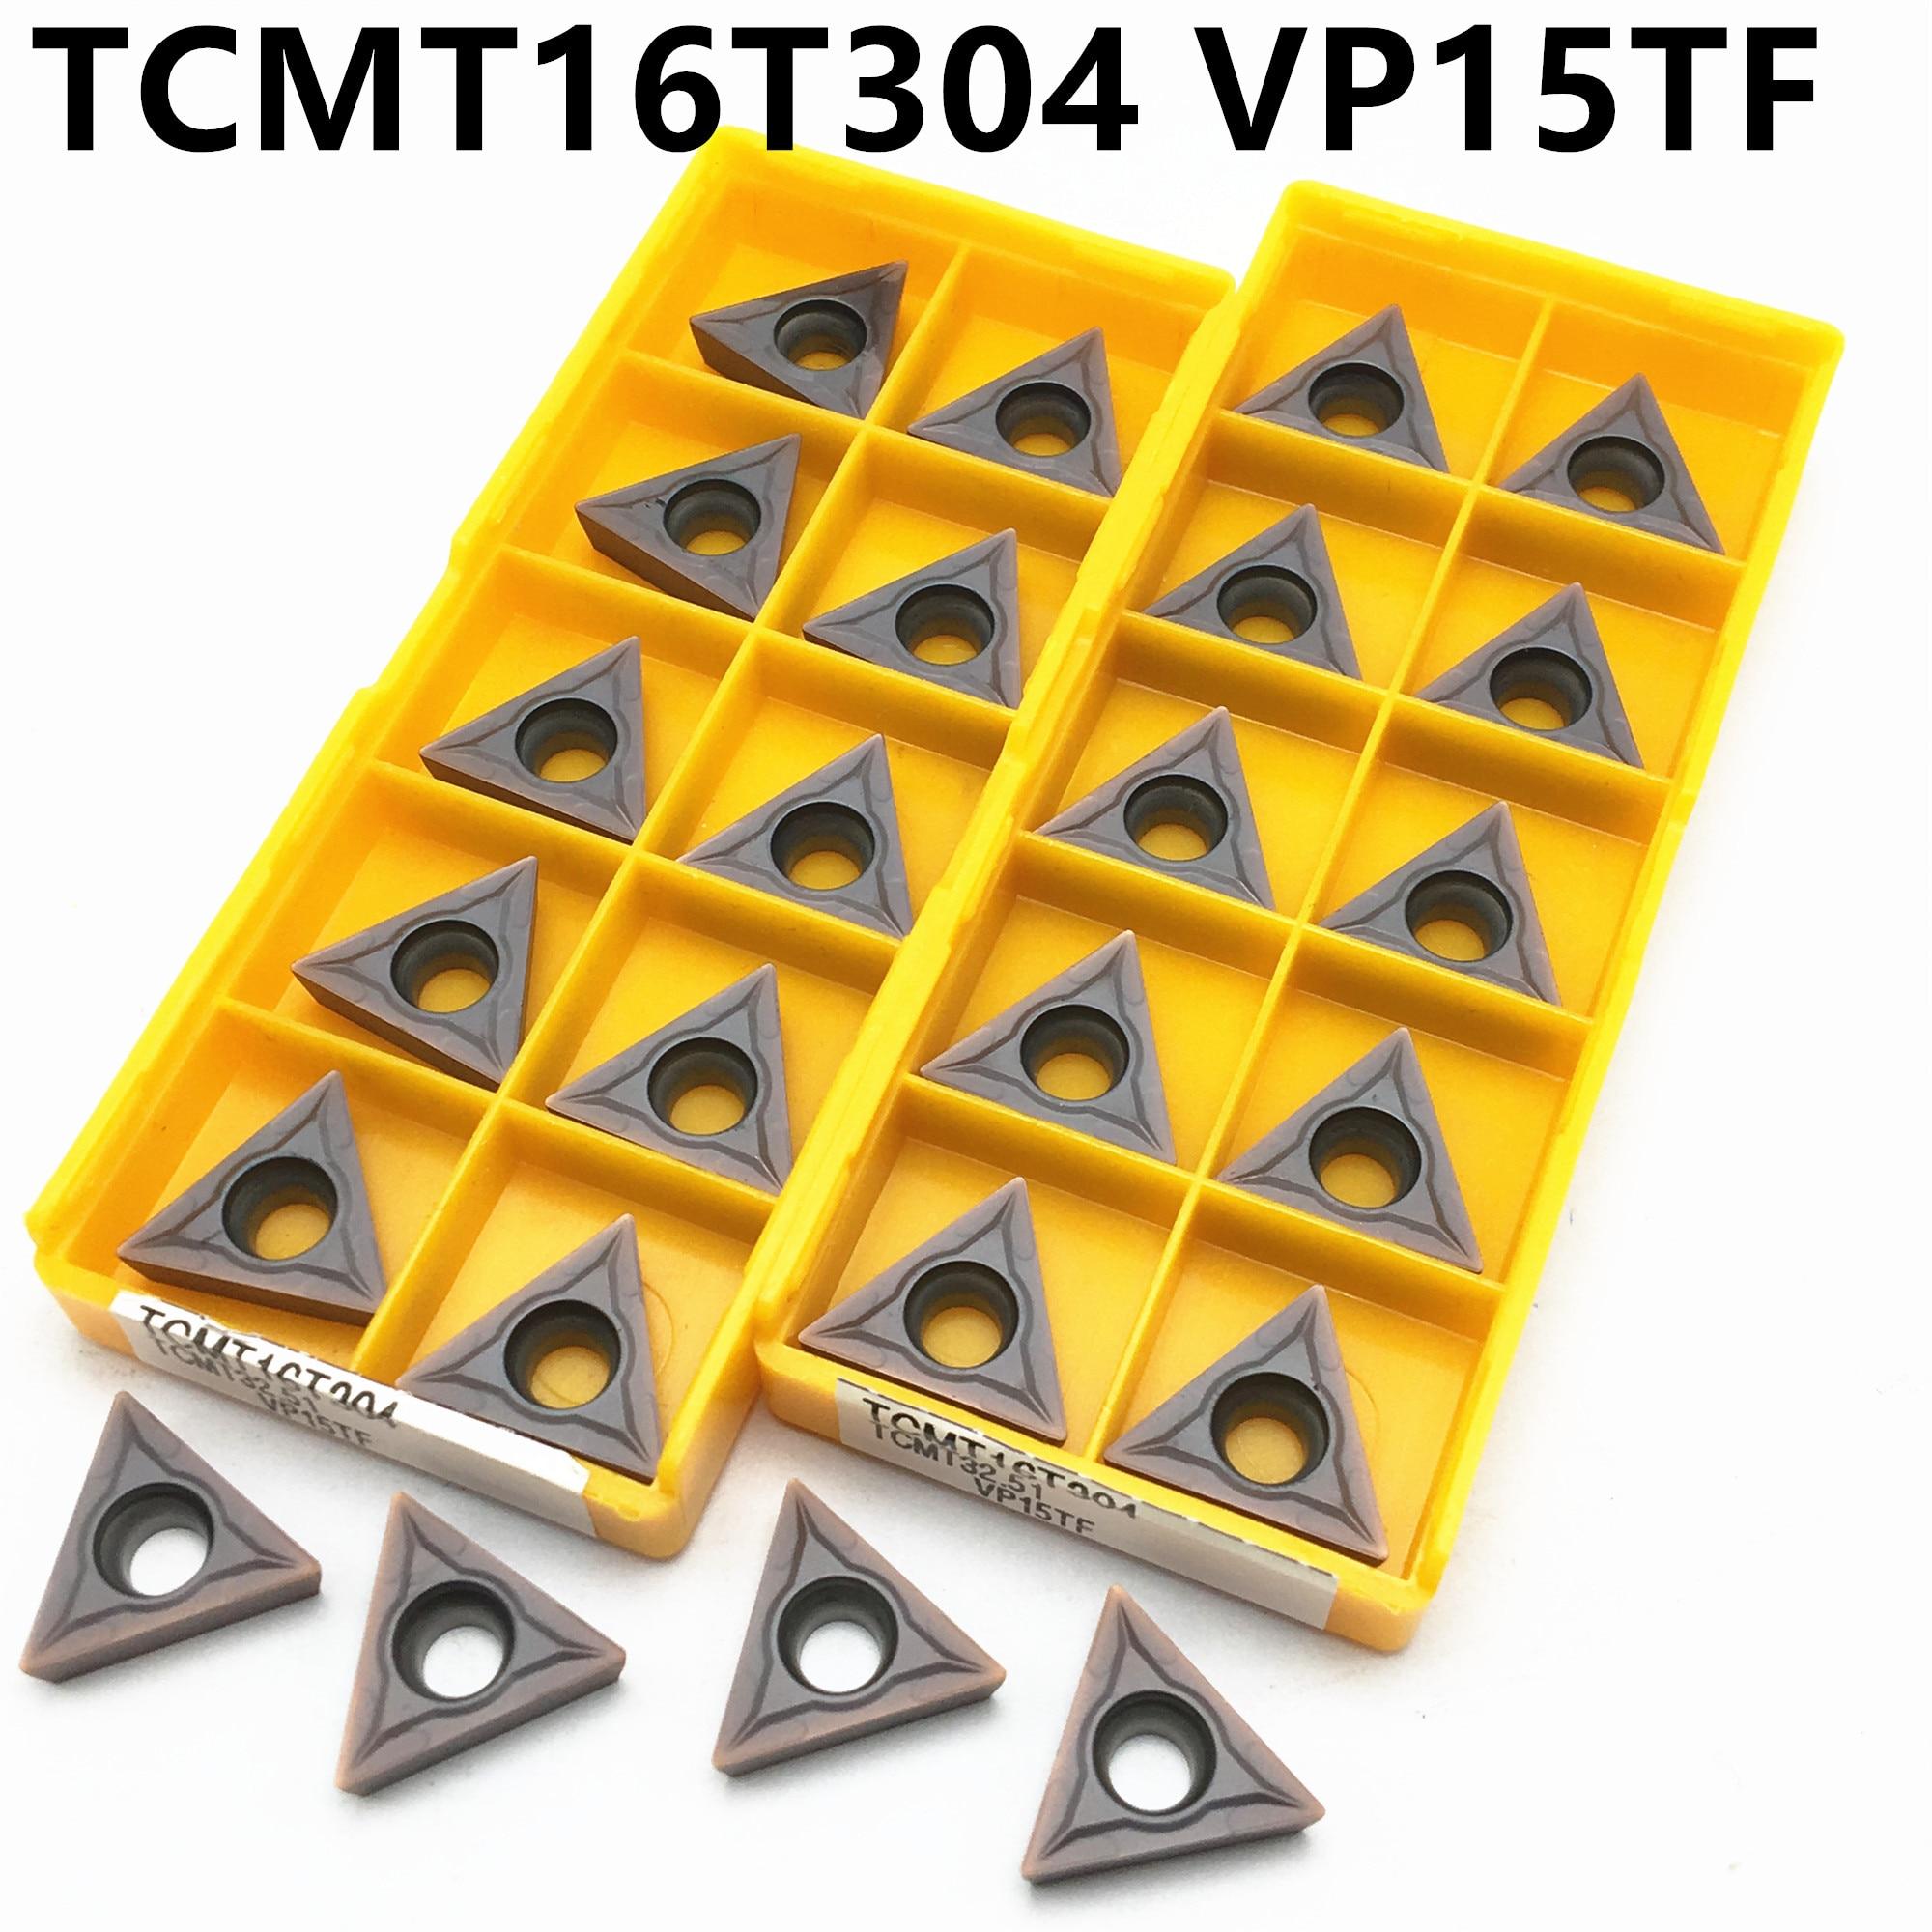 10PCS TCMT16T304 VP15TF Carbide Insert Turning Tool Internal Turning Tool Cutting Insert CNC Lathe Tool TCMT 16T304